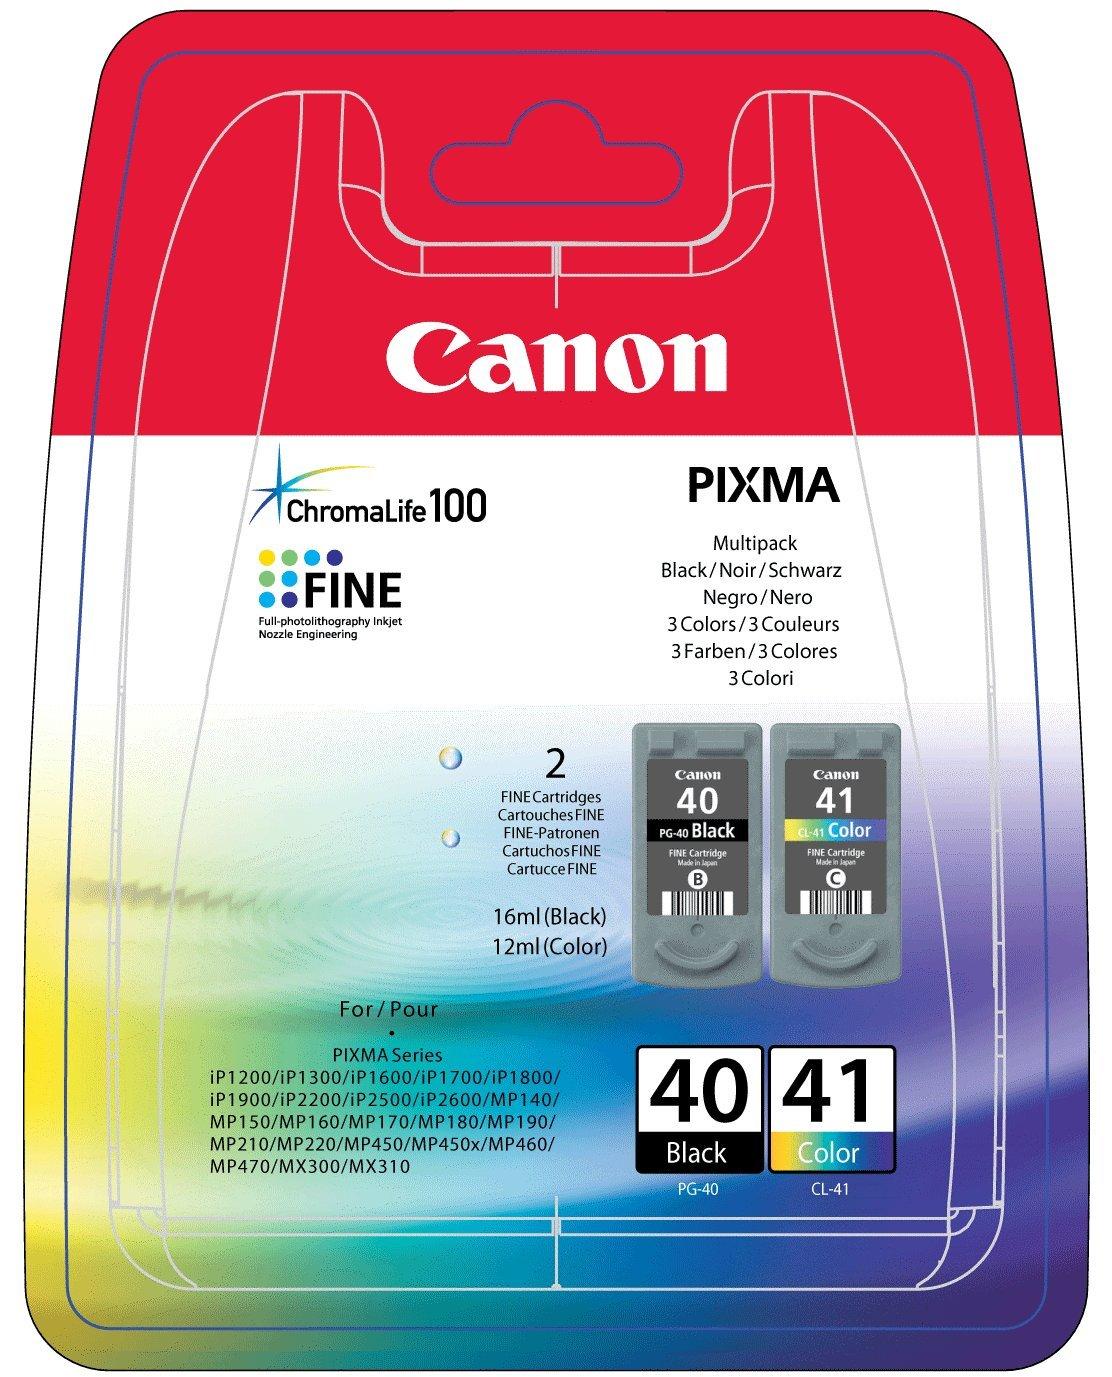 CANON PG-40 / CL-41 Tinte schwarz und farbig Standardkapazit�t combopack blister ohne Alarm